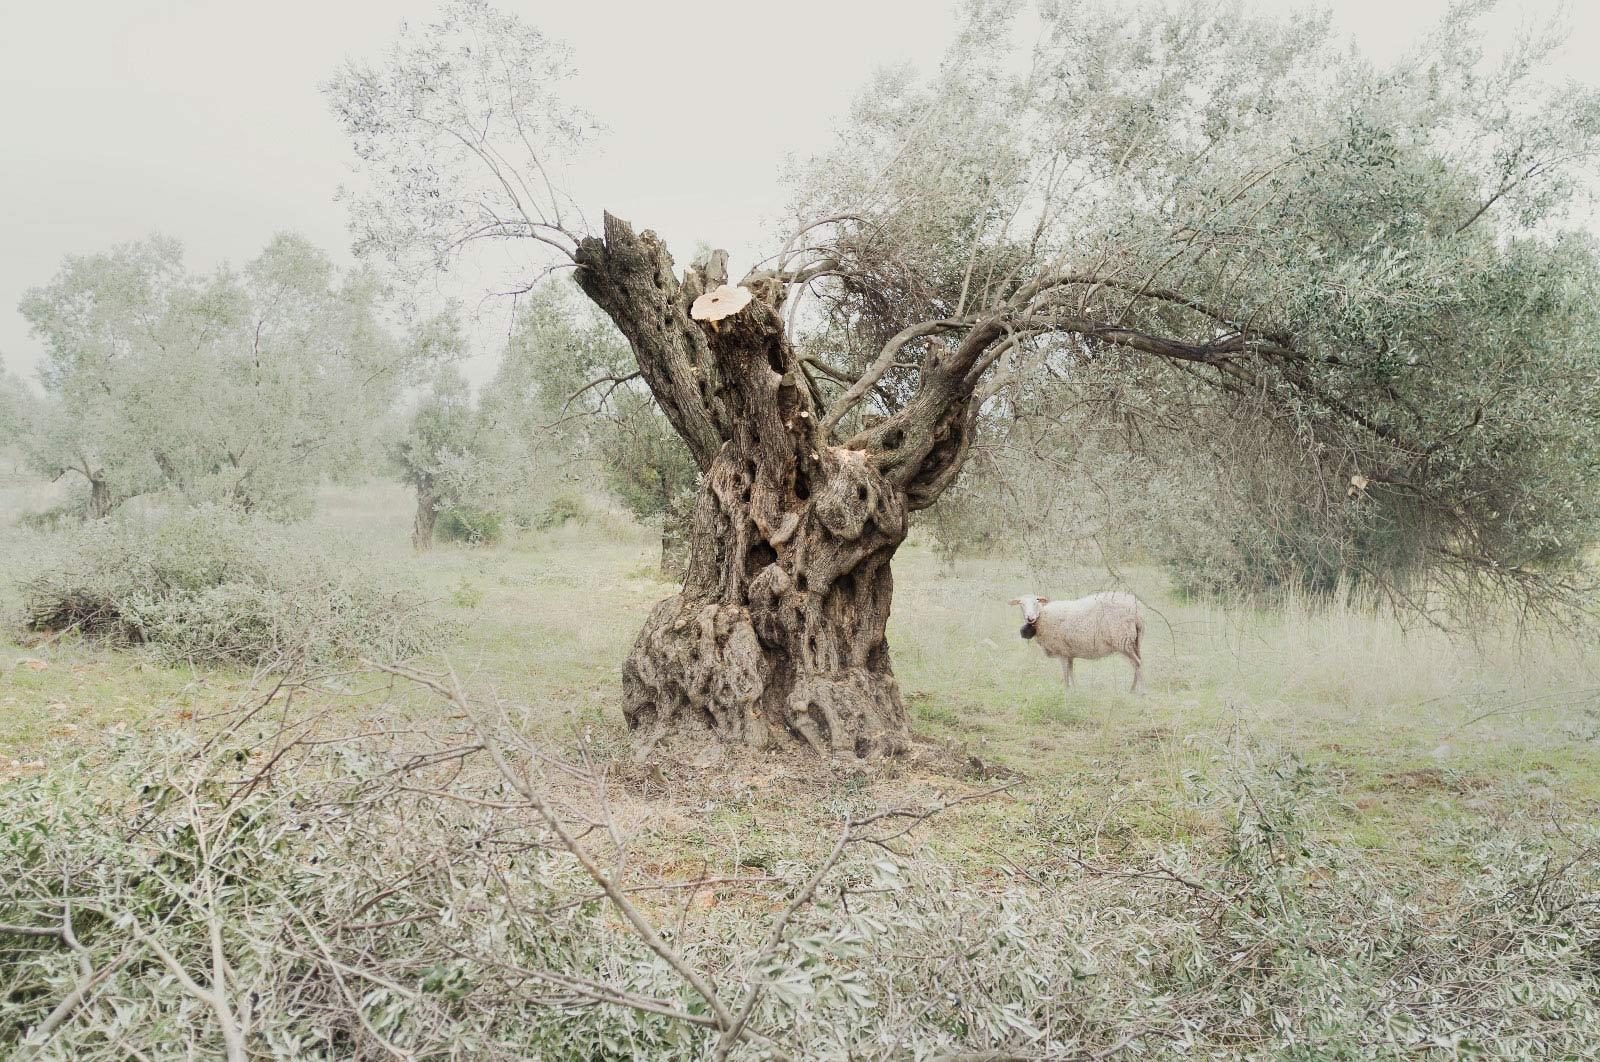 © Petros Koublis